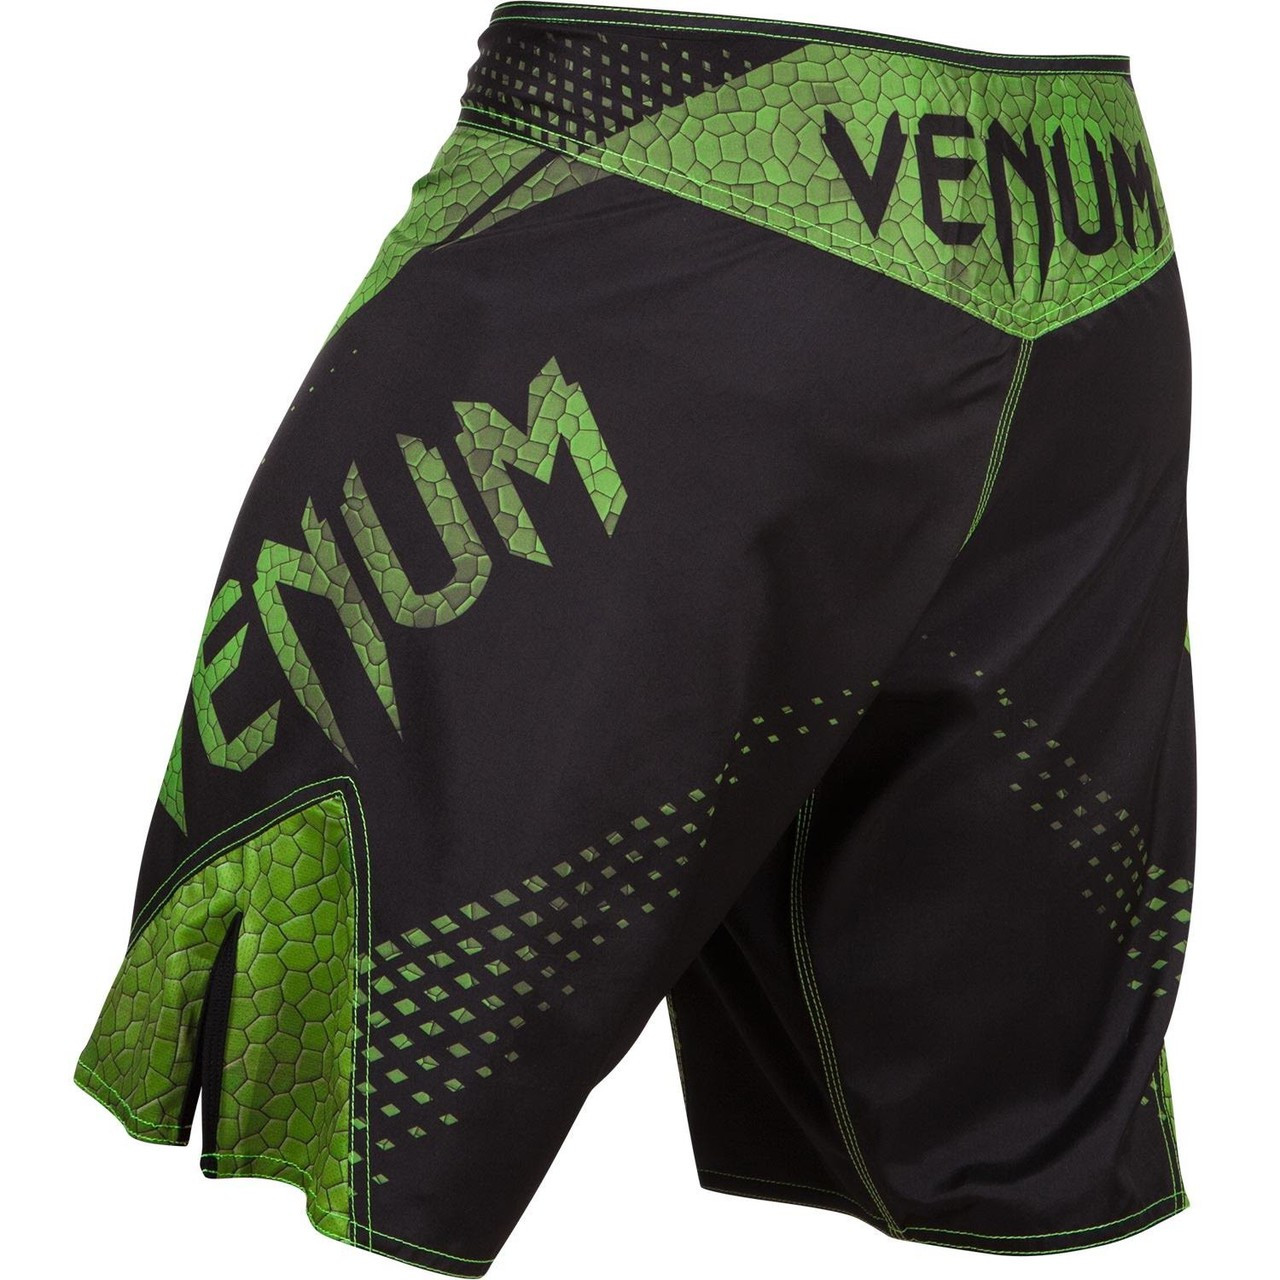 Back View Venum Hurricane Fightshorts Amazonia Green MMA Shorts now available at www.thejiujitsushop.com  Top MMA and Grappling Shorts  Enjoy Free Shipping from The Jiu Jitsu Shop today!